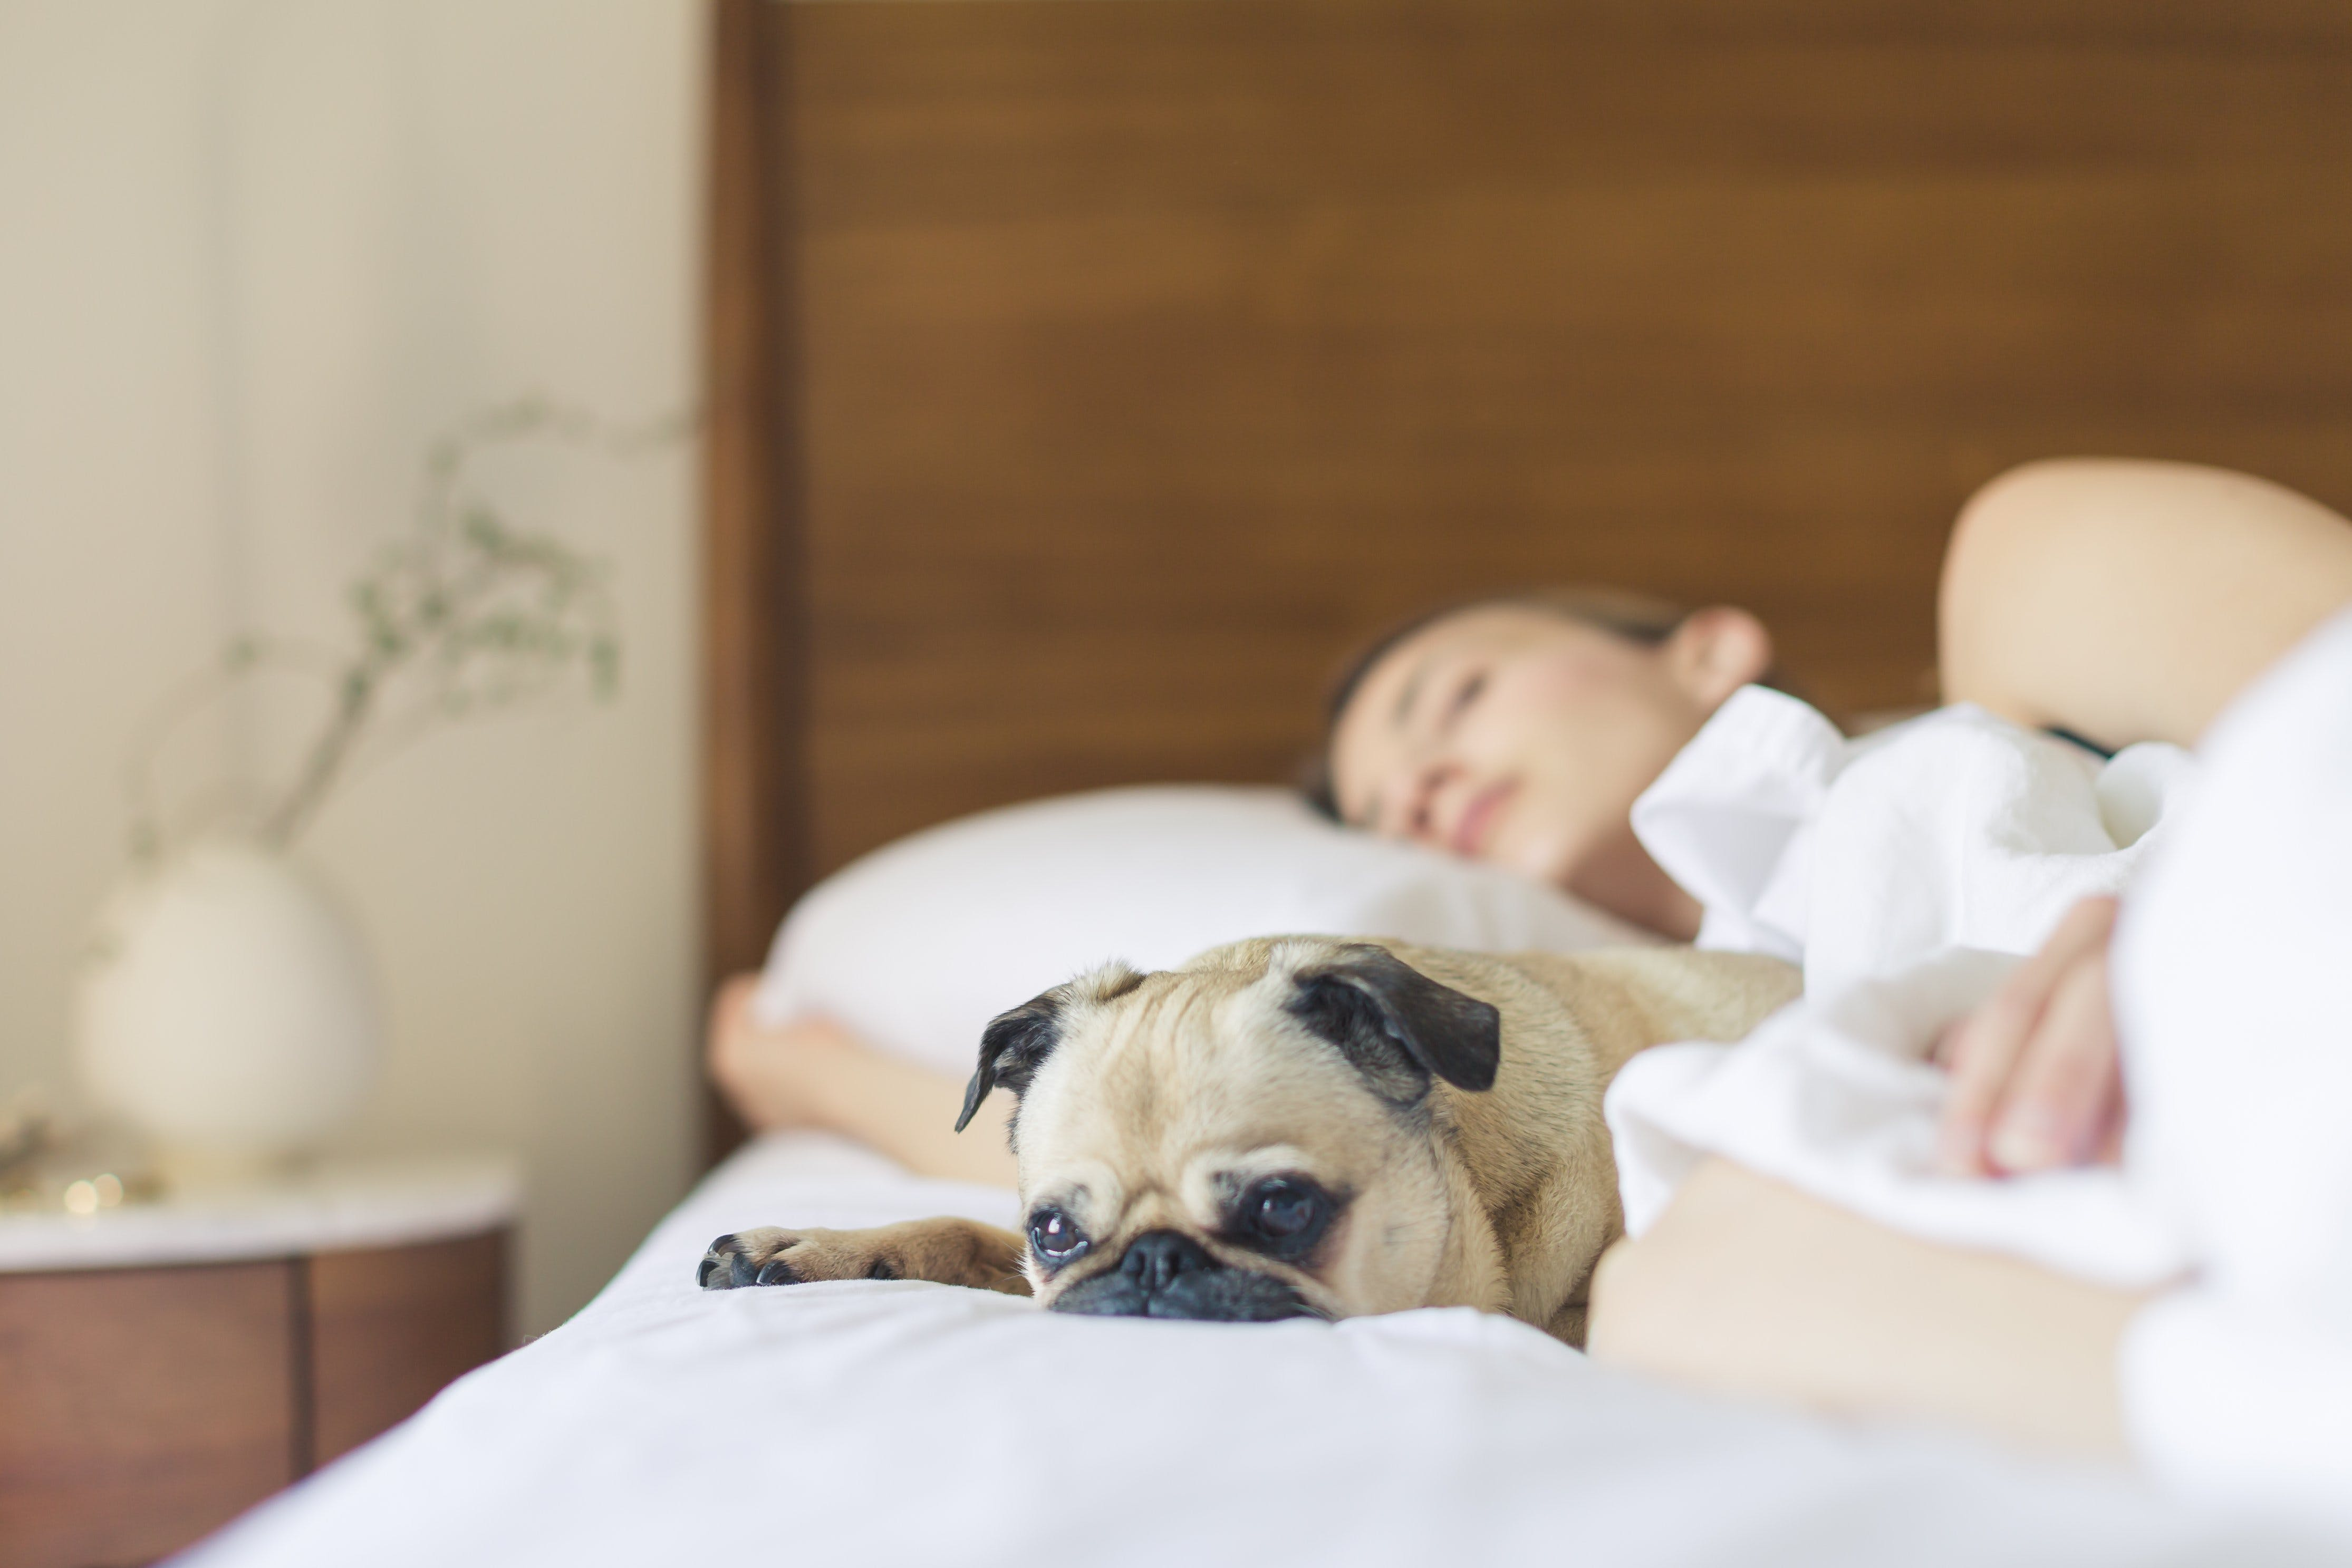 Pug Sleeping Beside Woman on Bed